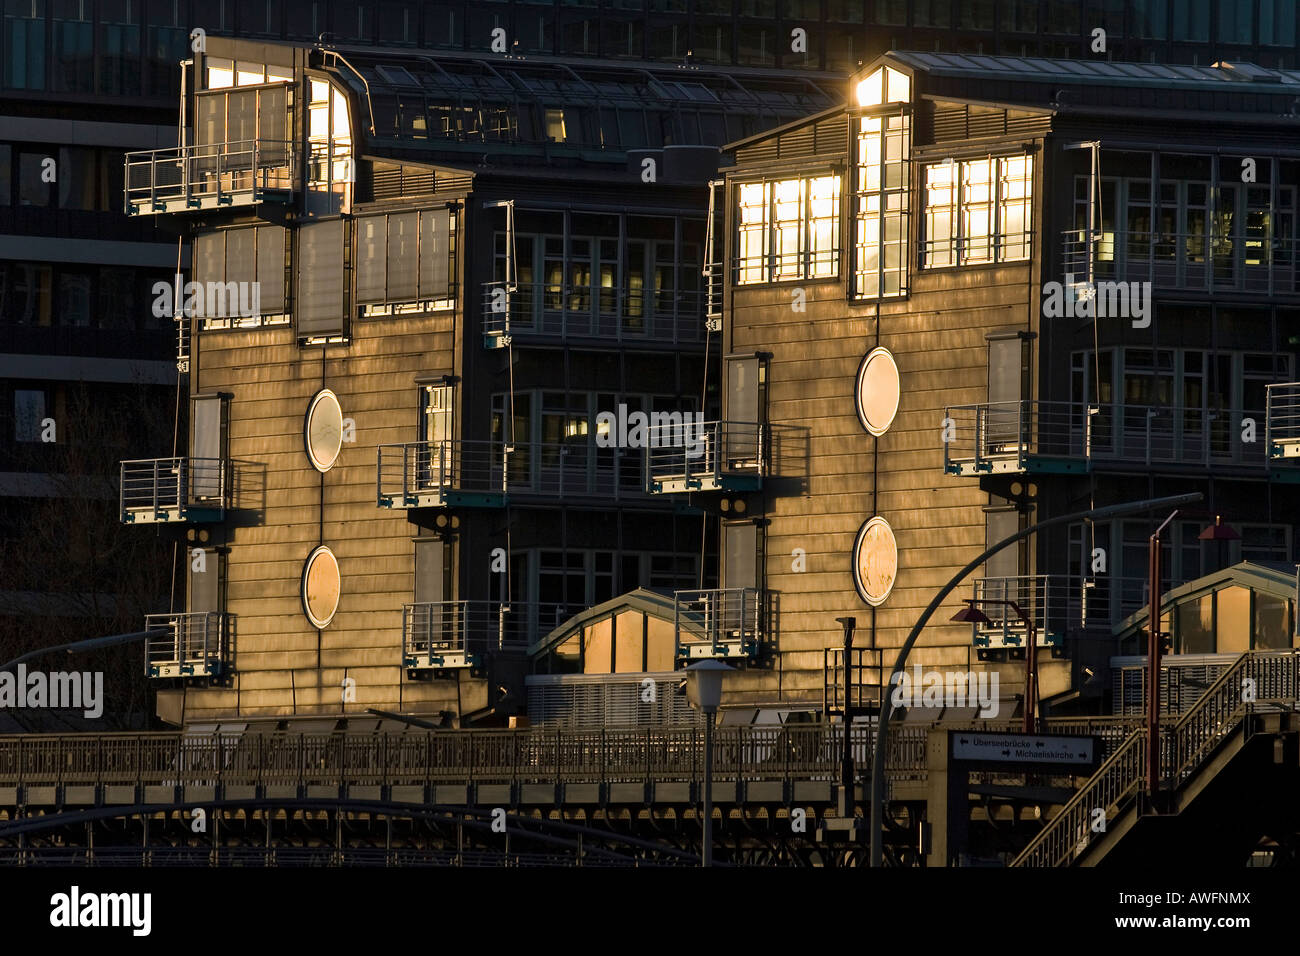 Modern publishing house of the Gruner and Jahr Verlag in Hamburg in evening light - Hamburg harbour, Germany, Europe - Stock Image